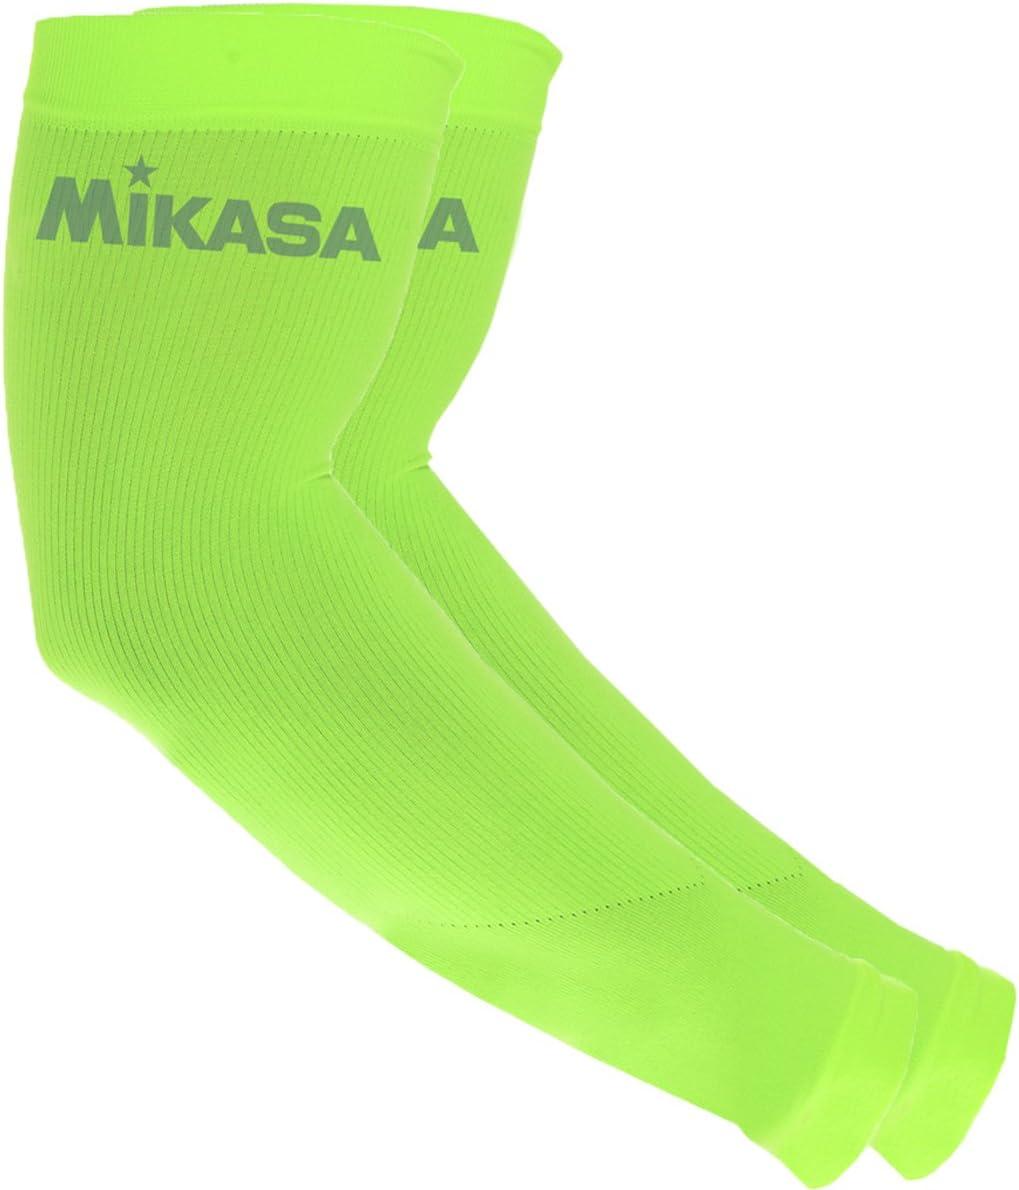 Mikasa SUMIKO Calentadores para Brazos, Otoño-Invierno, Unisex ...